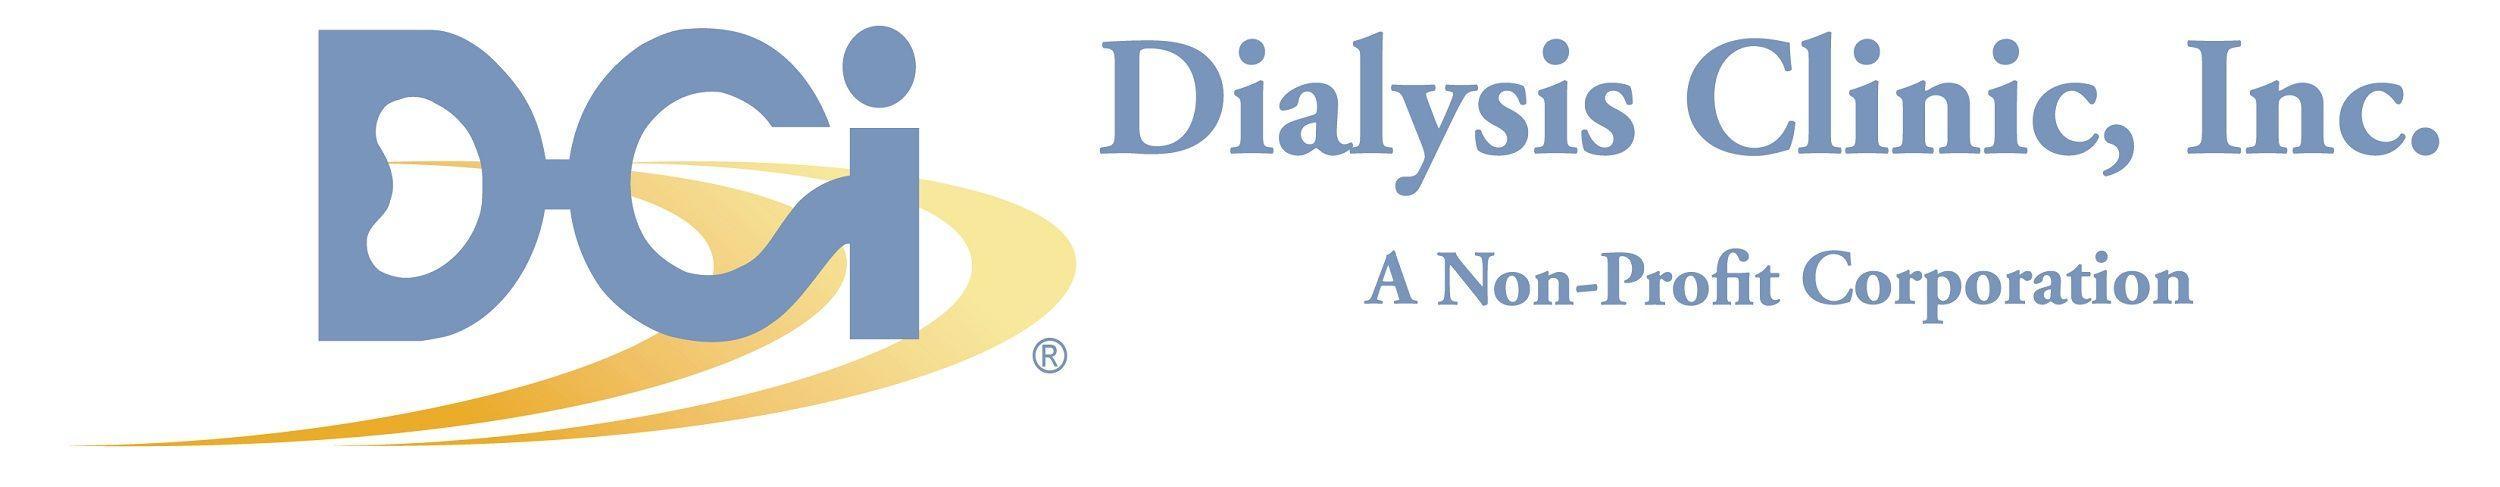 Dialysis Clinic Inc. (DCI)